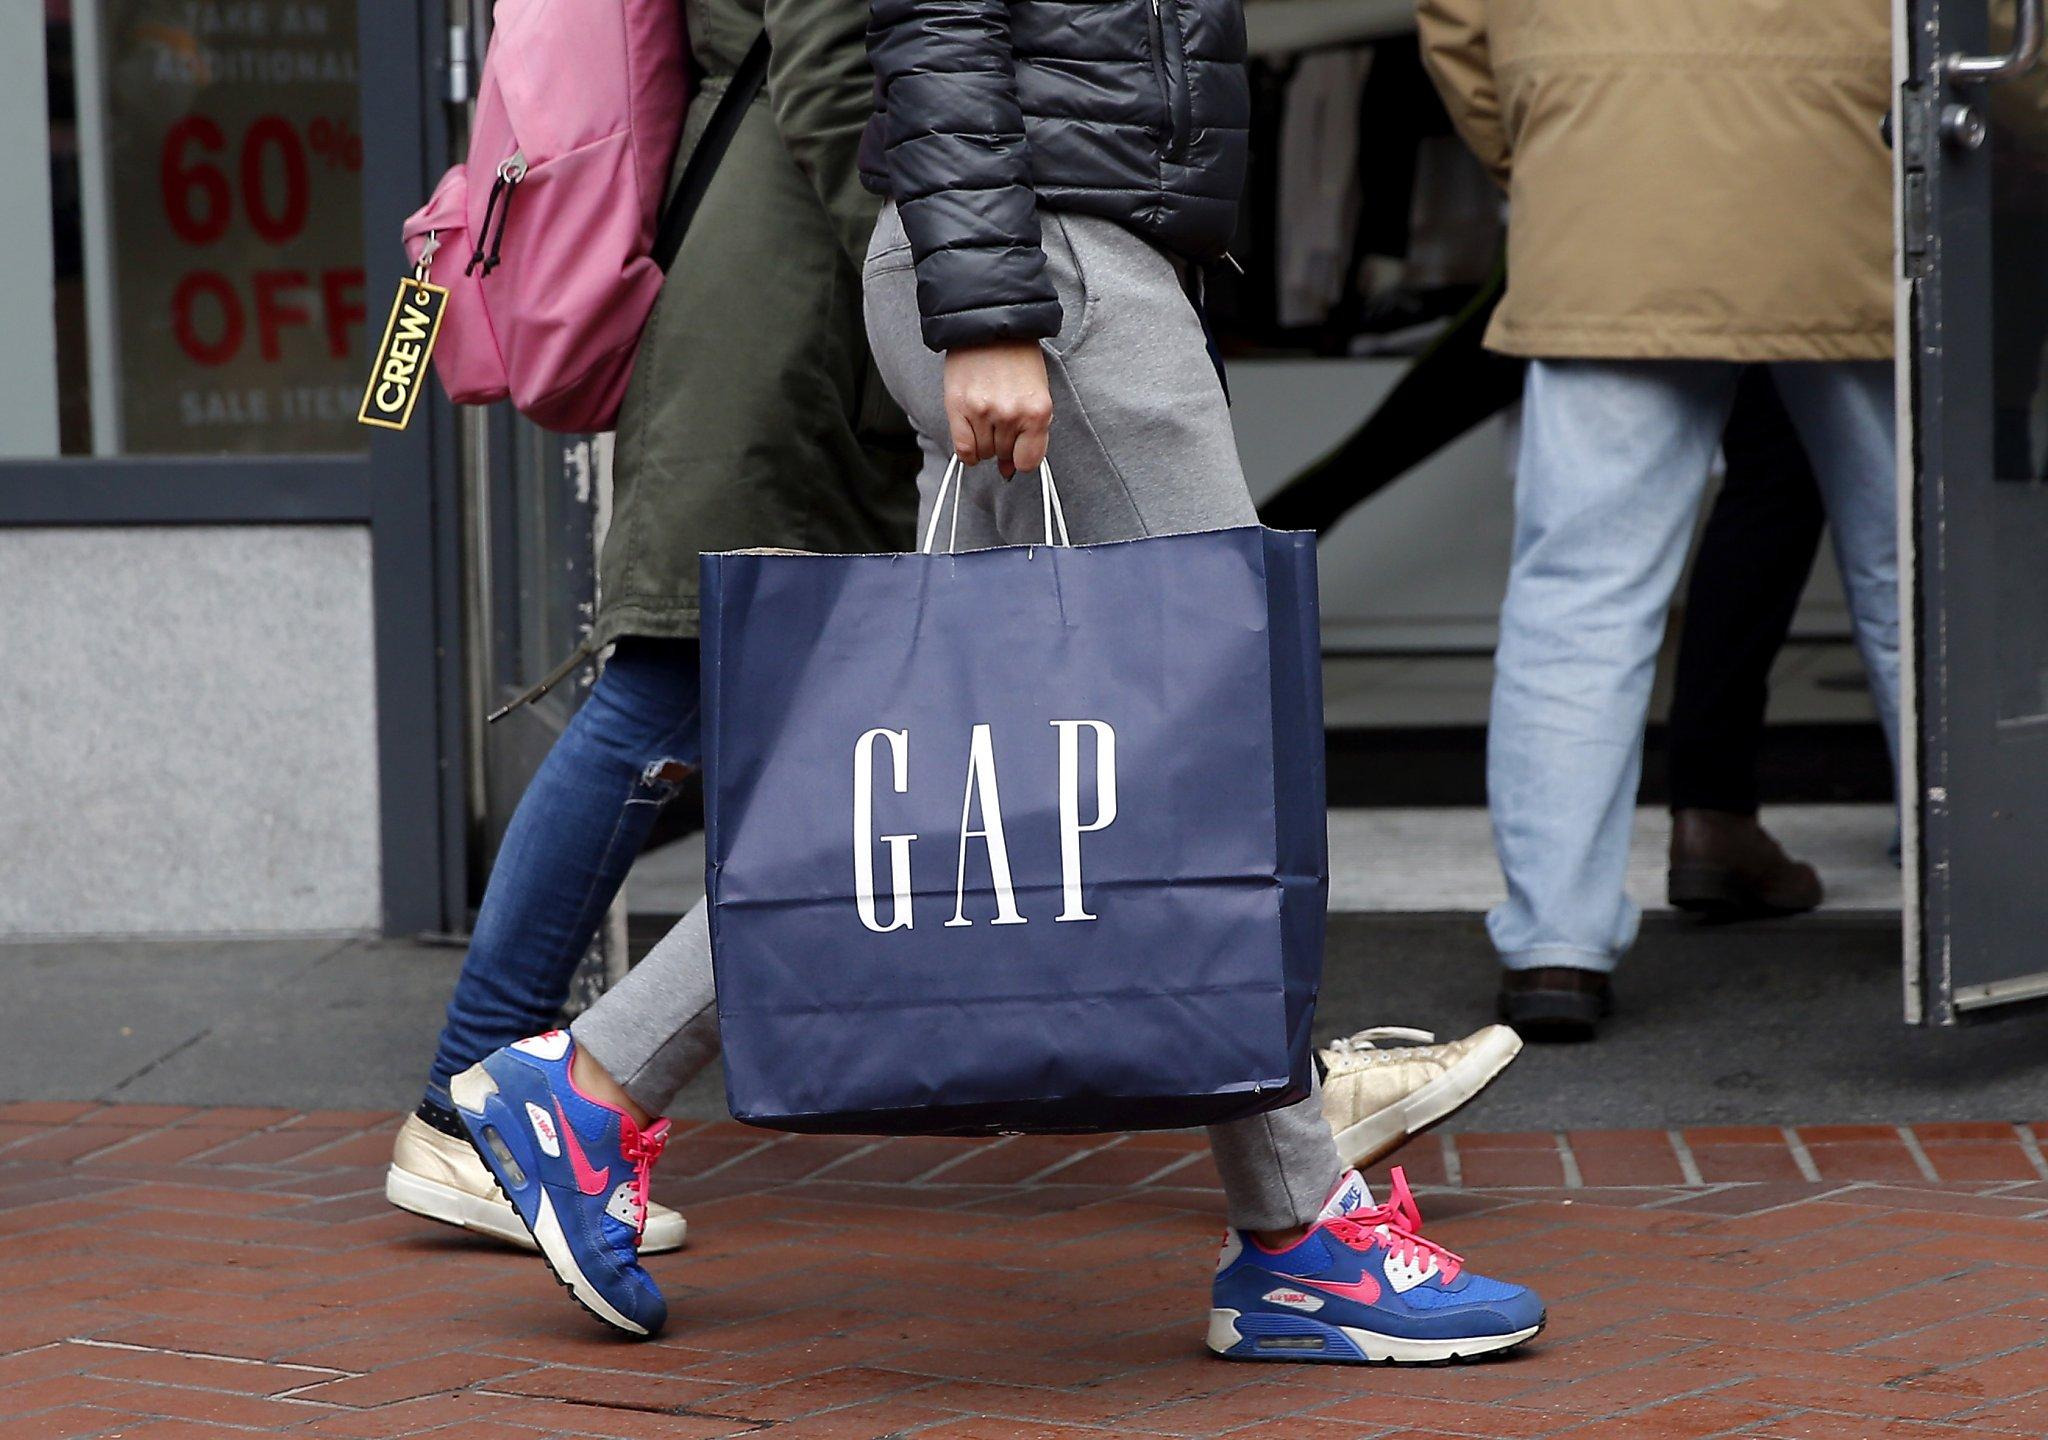 Gap s future lies with Bankruptcy Court - SFChronicle.com 9c9e749b8c24a